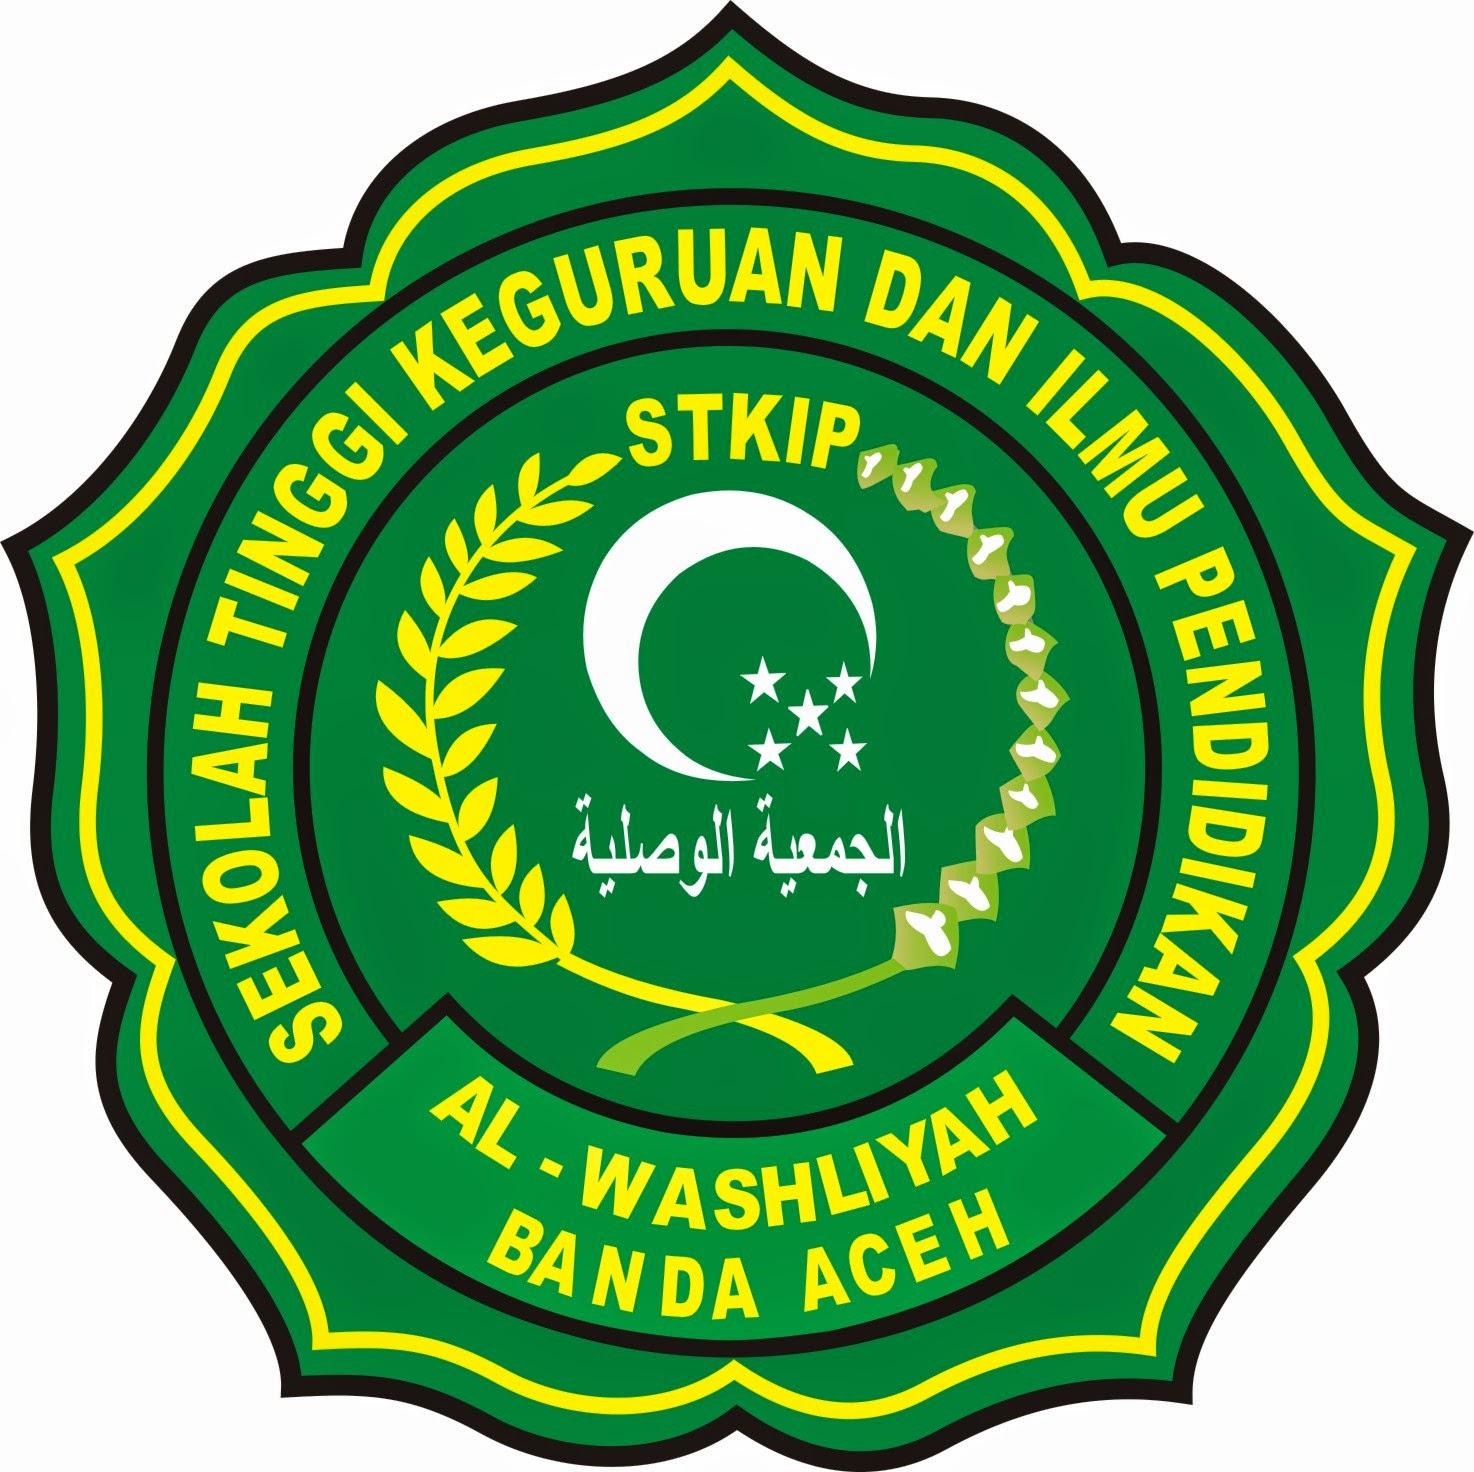 Logo STKIP Al Washliyah Banda Aceh